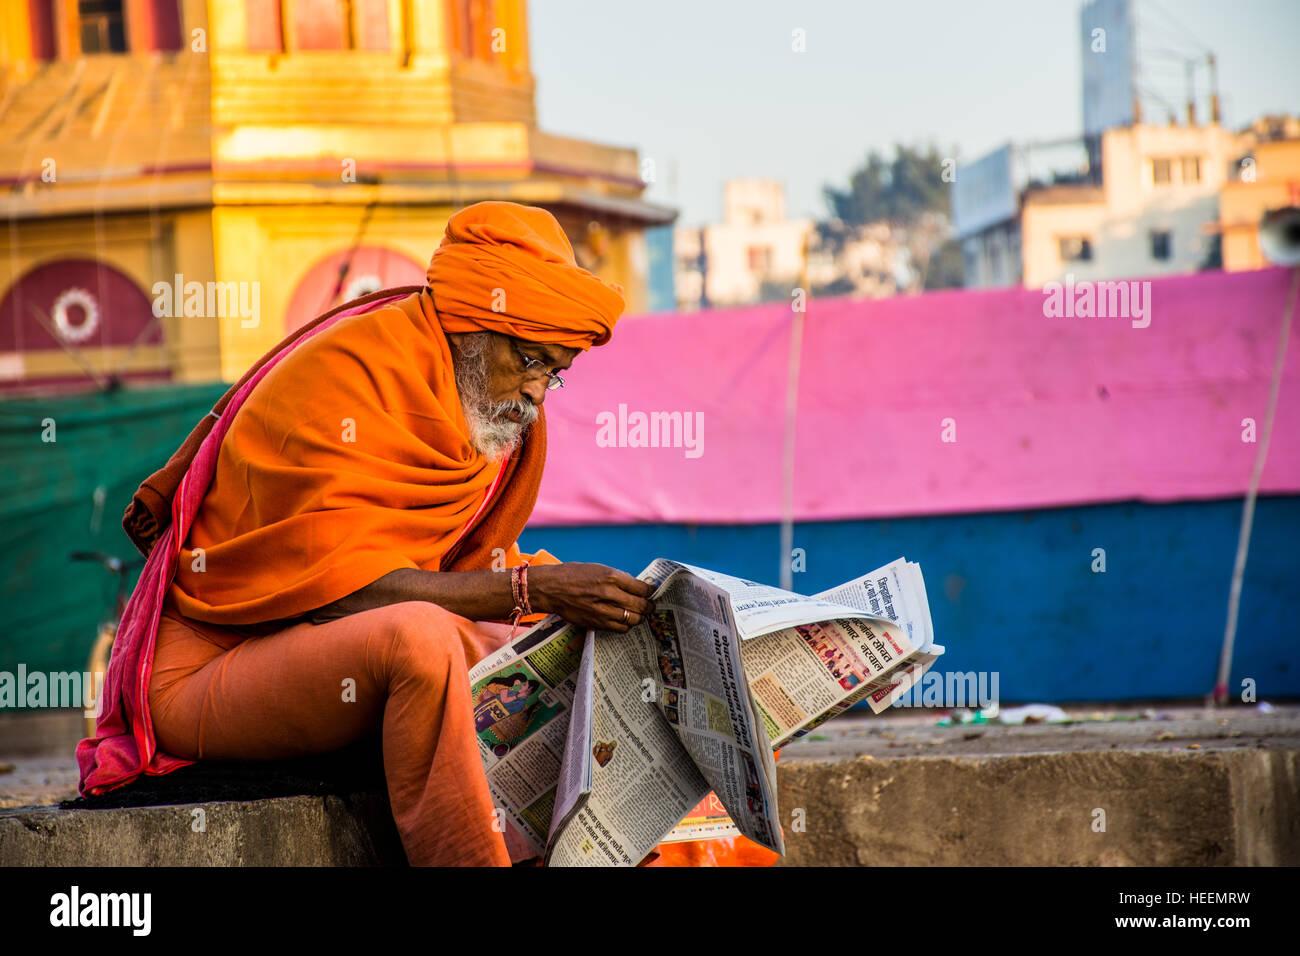 A sadhu reading newspaper. - Stock Image